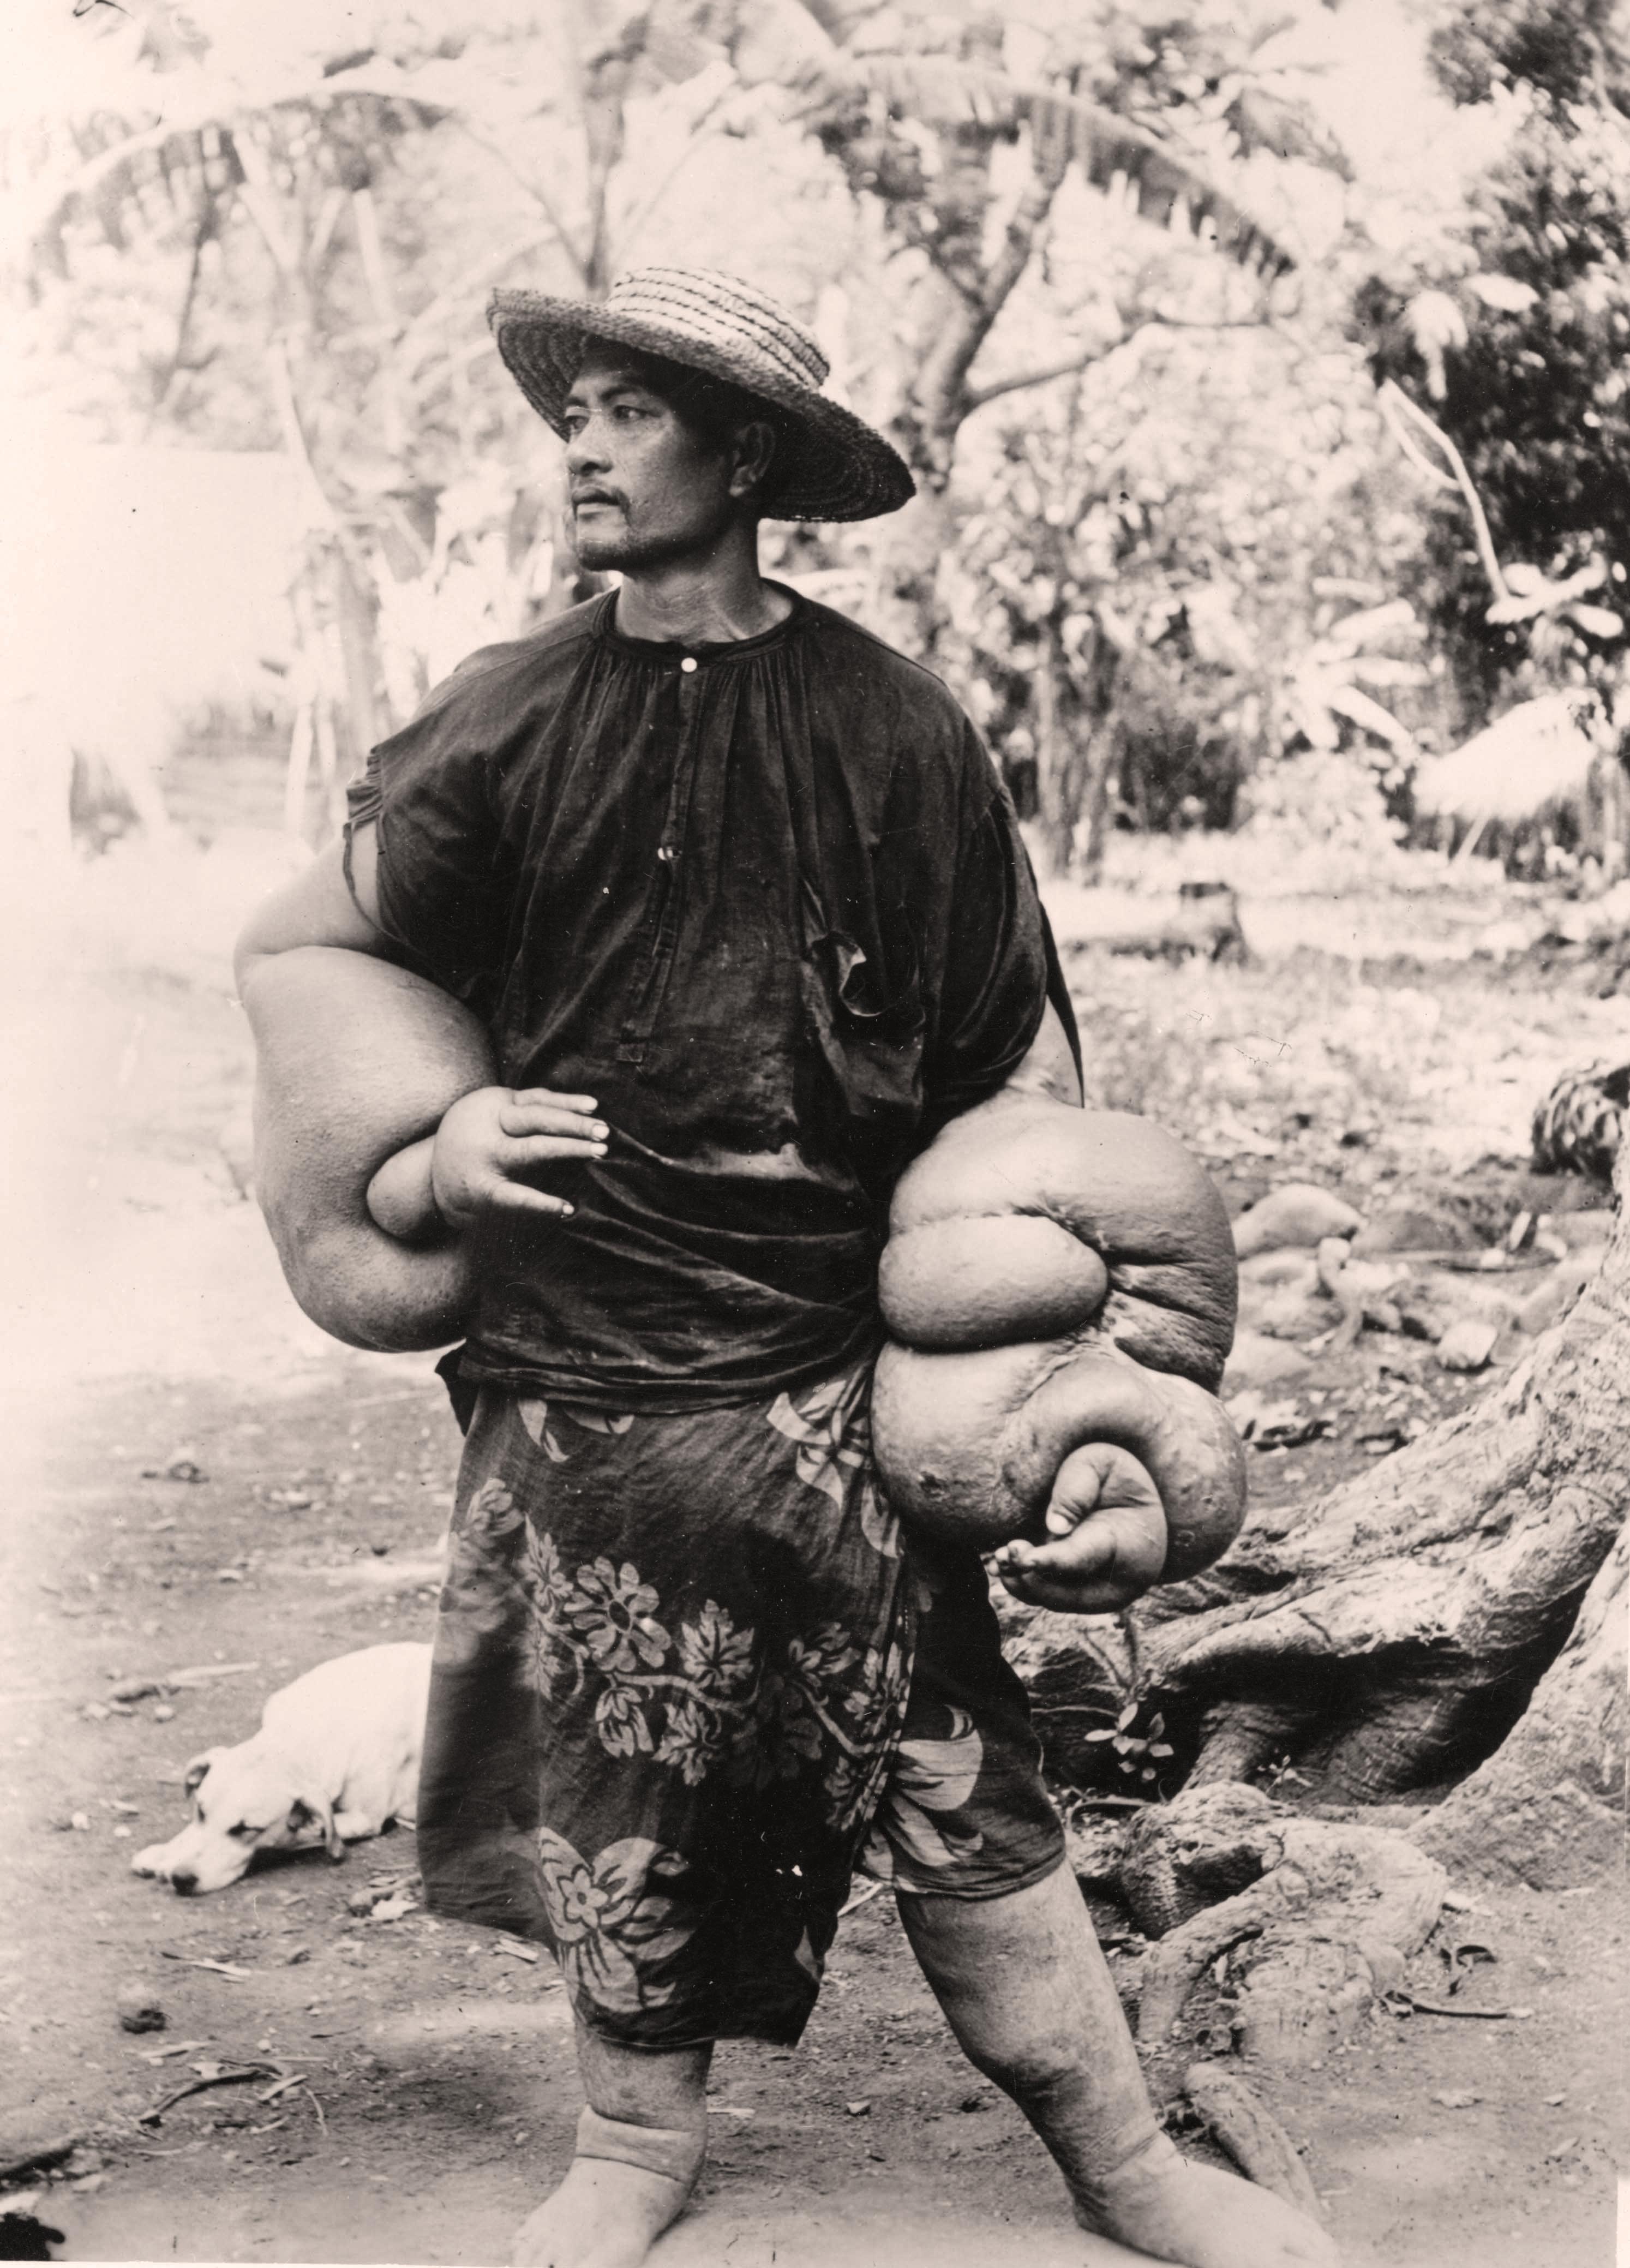 Cas d'éléphantiasis des bras, Tahiti vers 1950